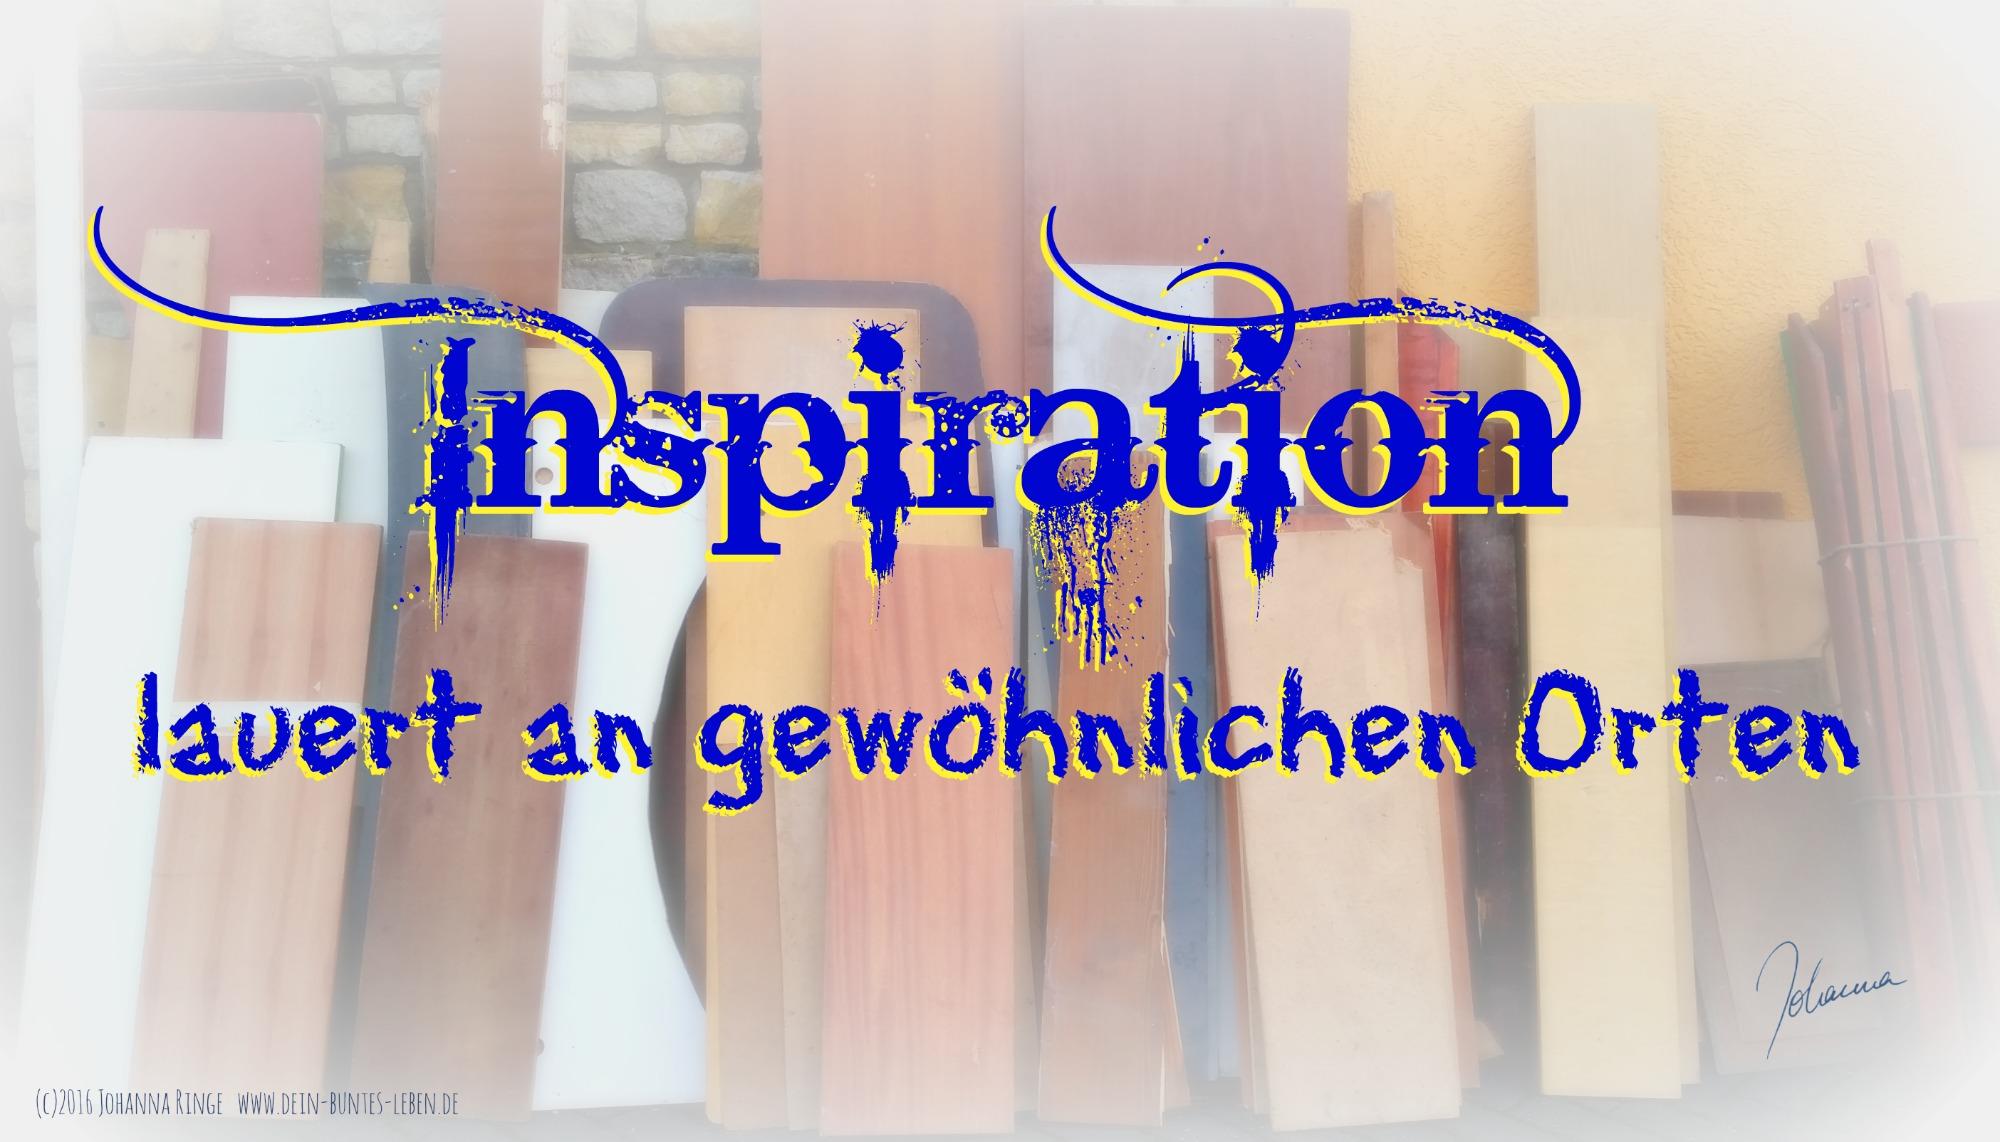 Inspiration lauert überall! (c)2016 Johanna Ringe www.dein-buntes-leben.de